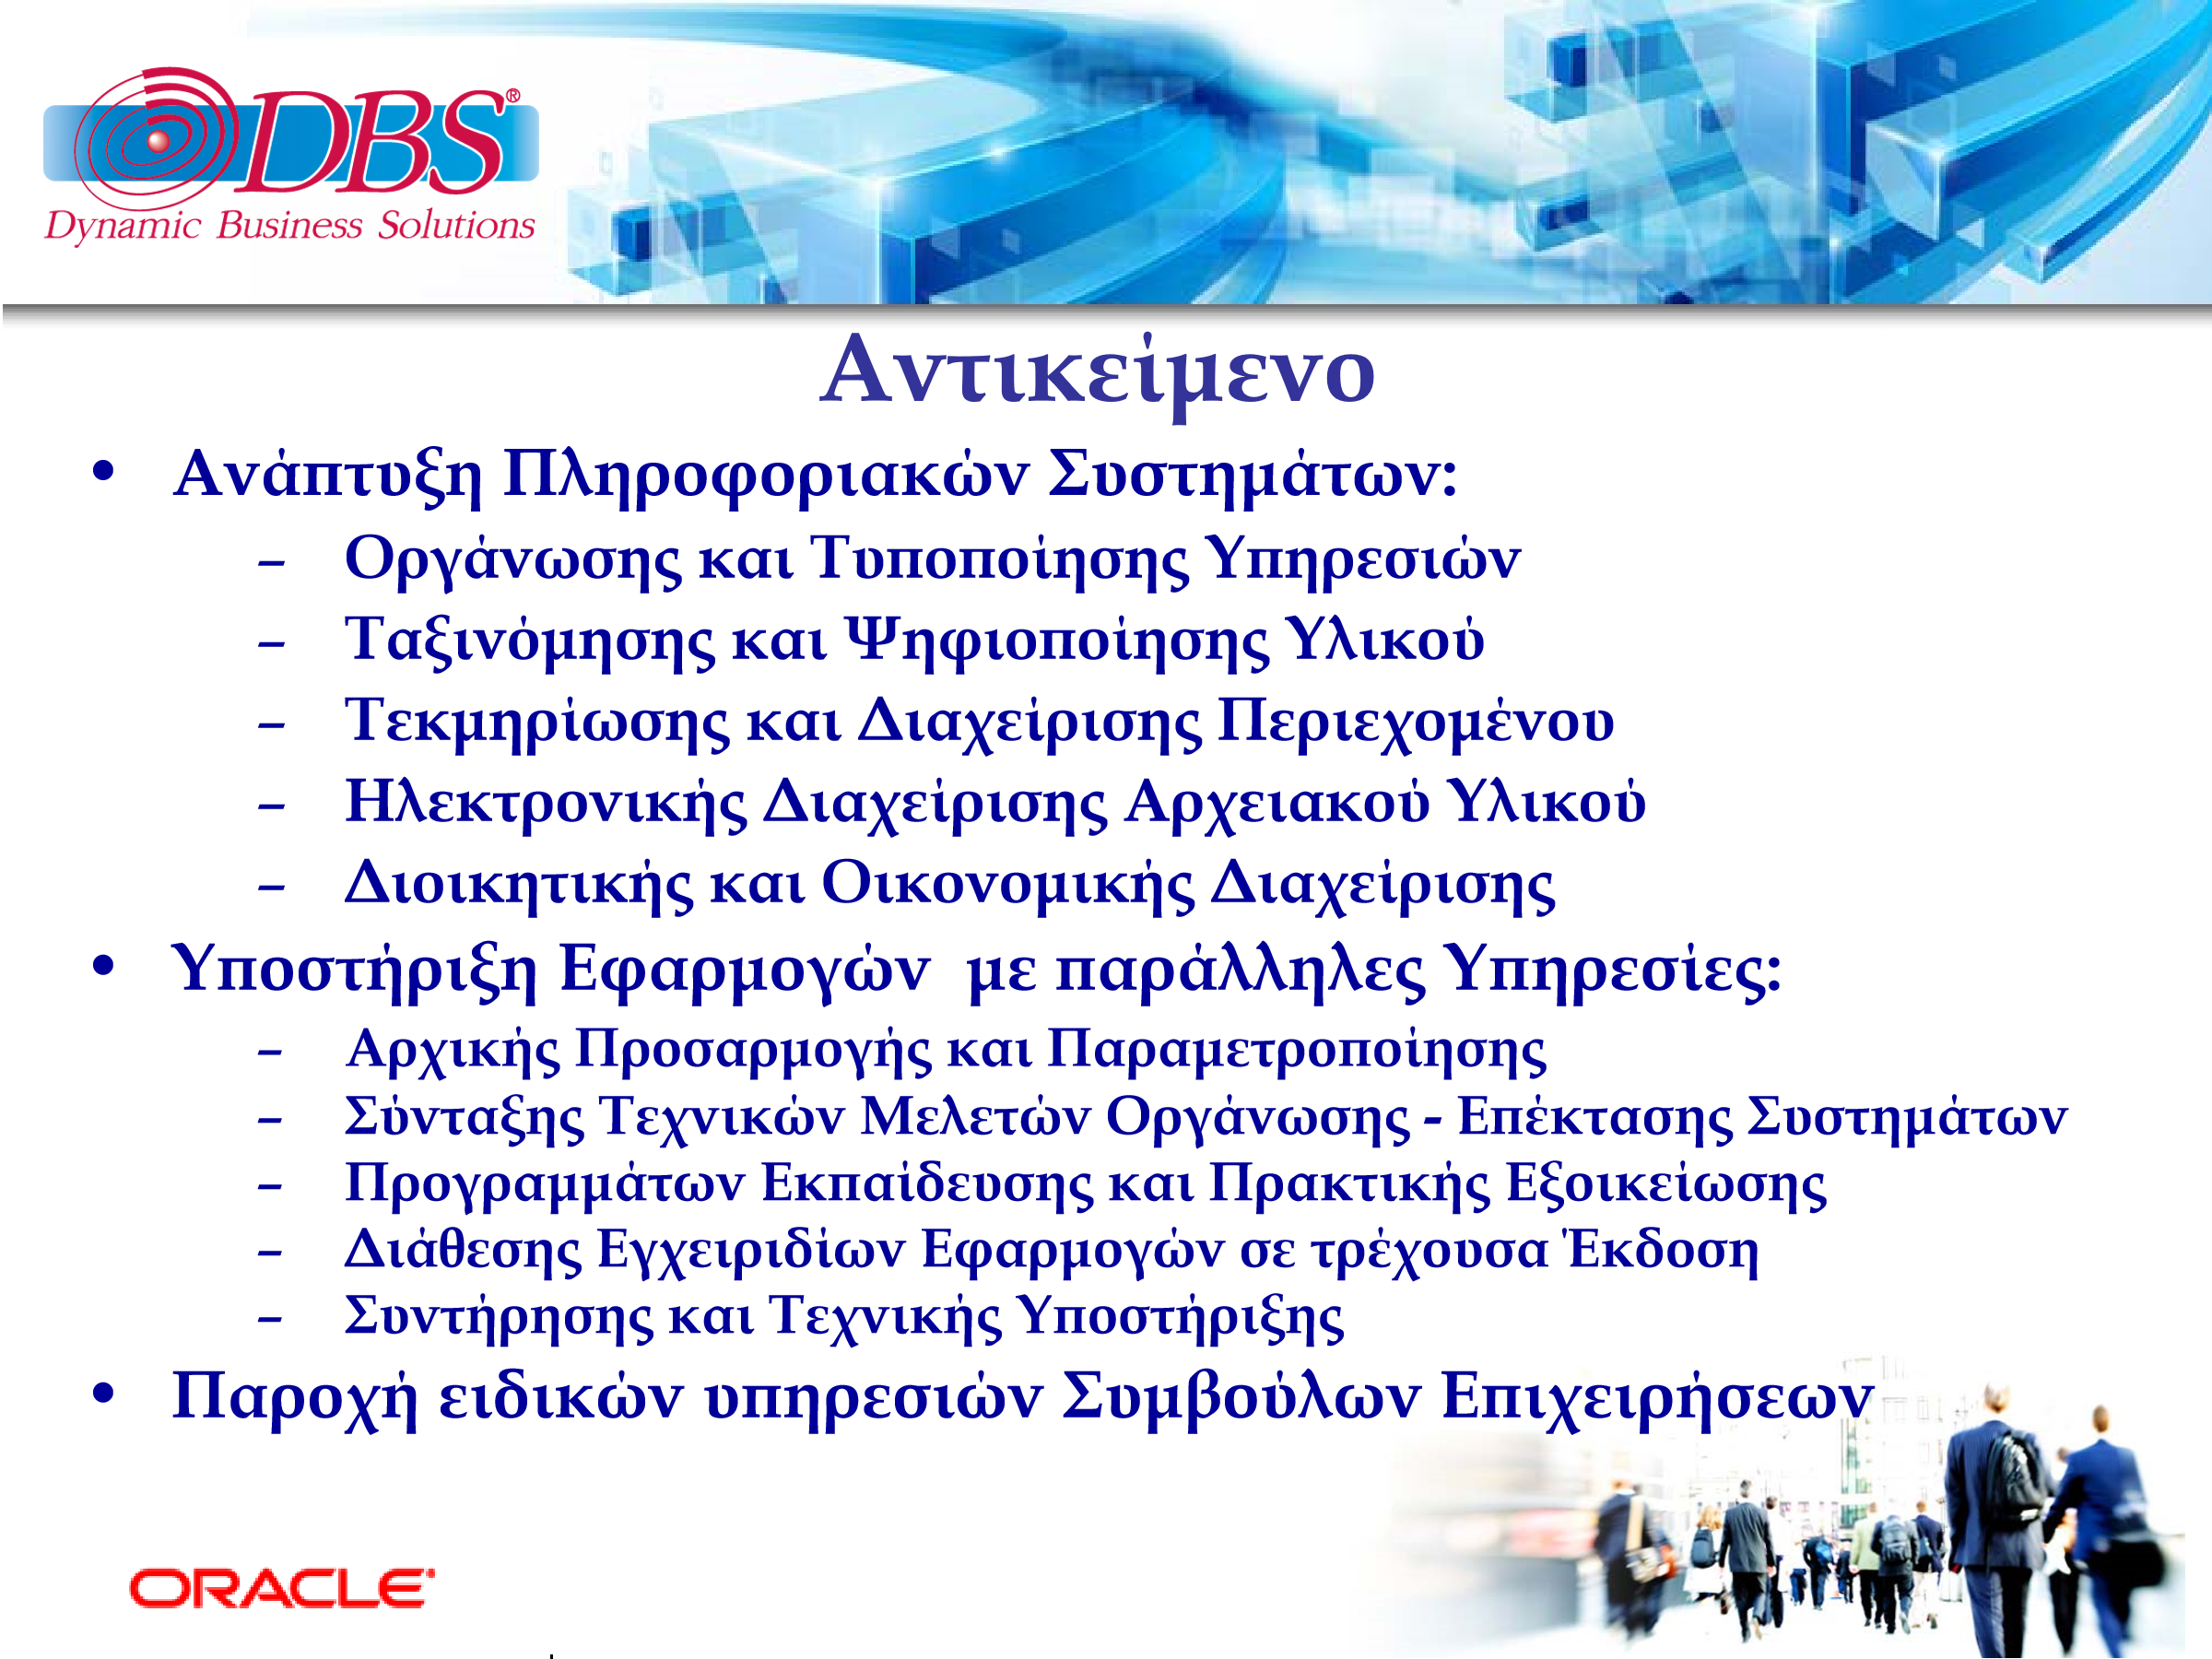 DBSDEMO2019_COMPANY_PROFILE_V18_R26FB-EL-3